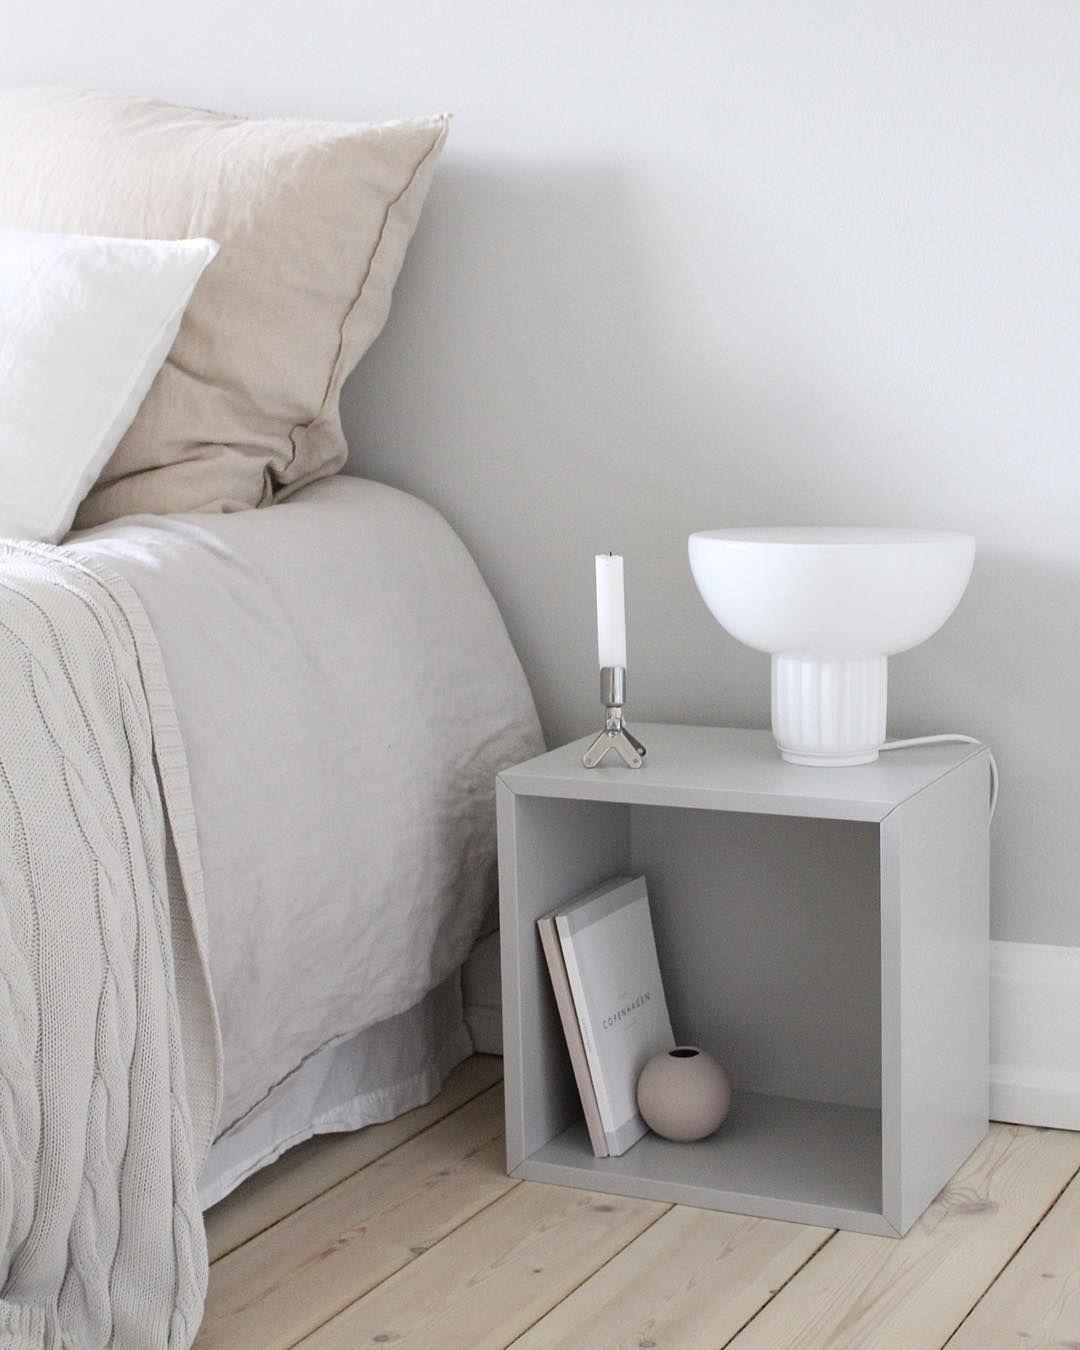 Pin by елена on интерьер in 2020 Bedroom decor design